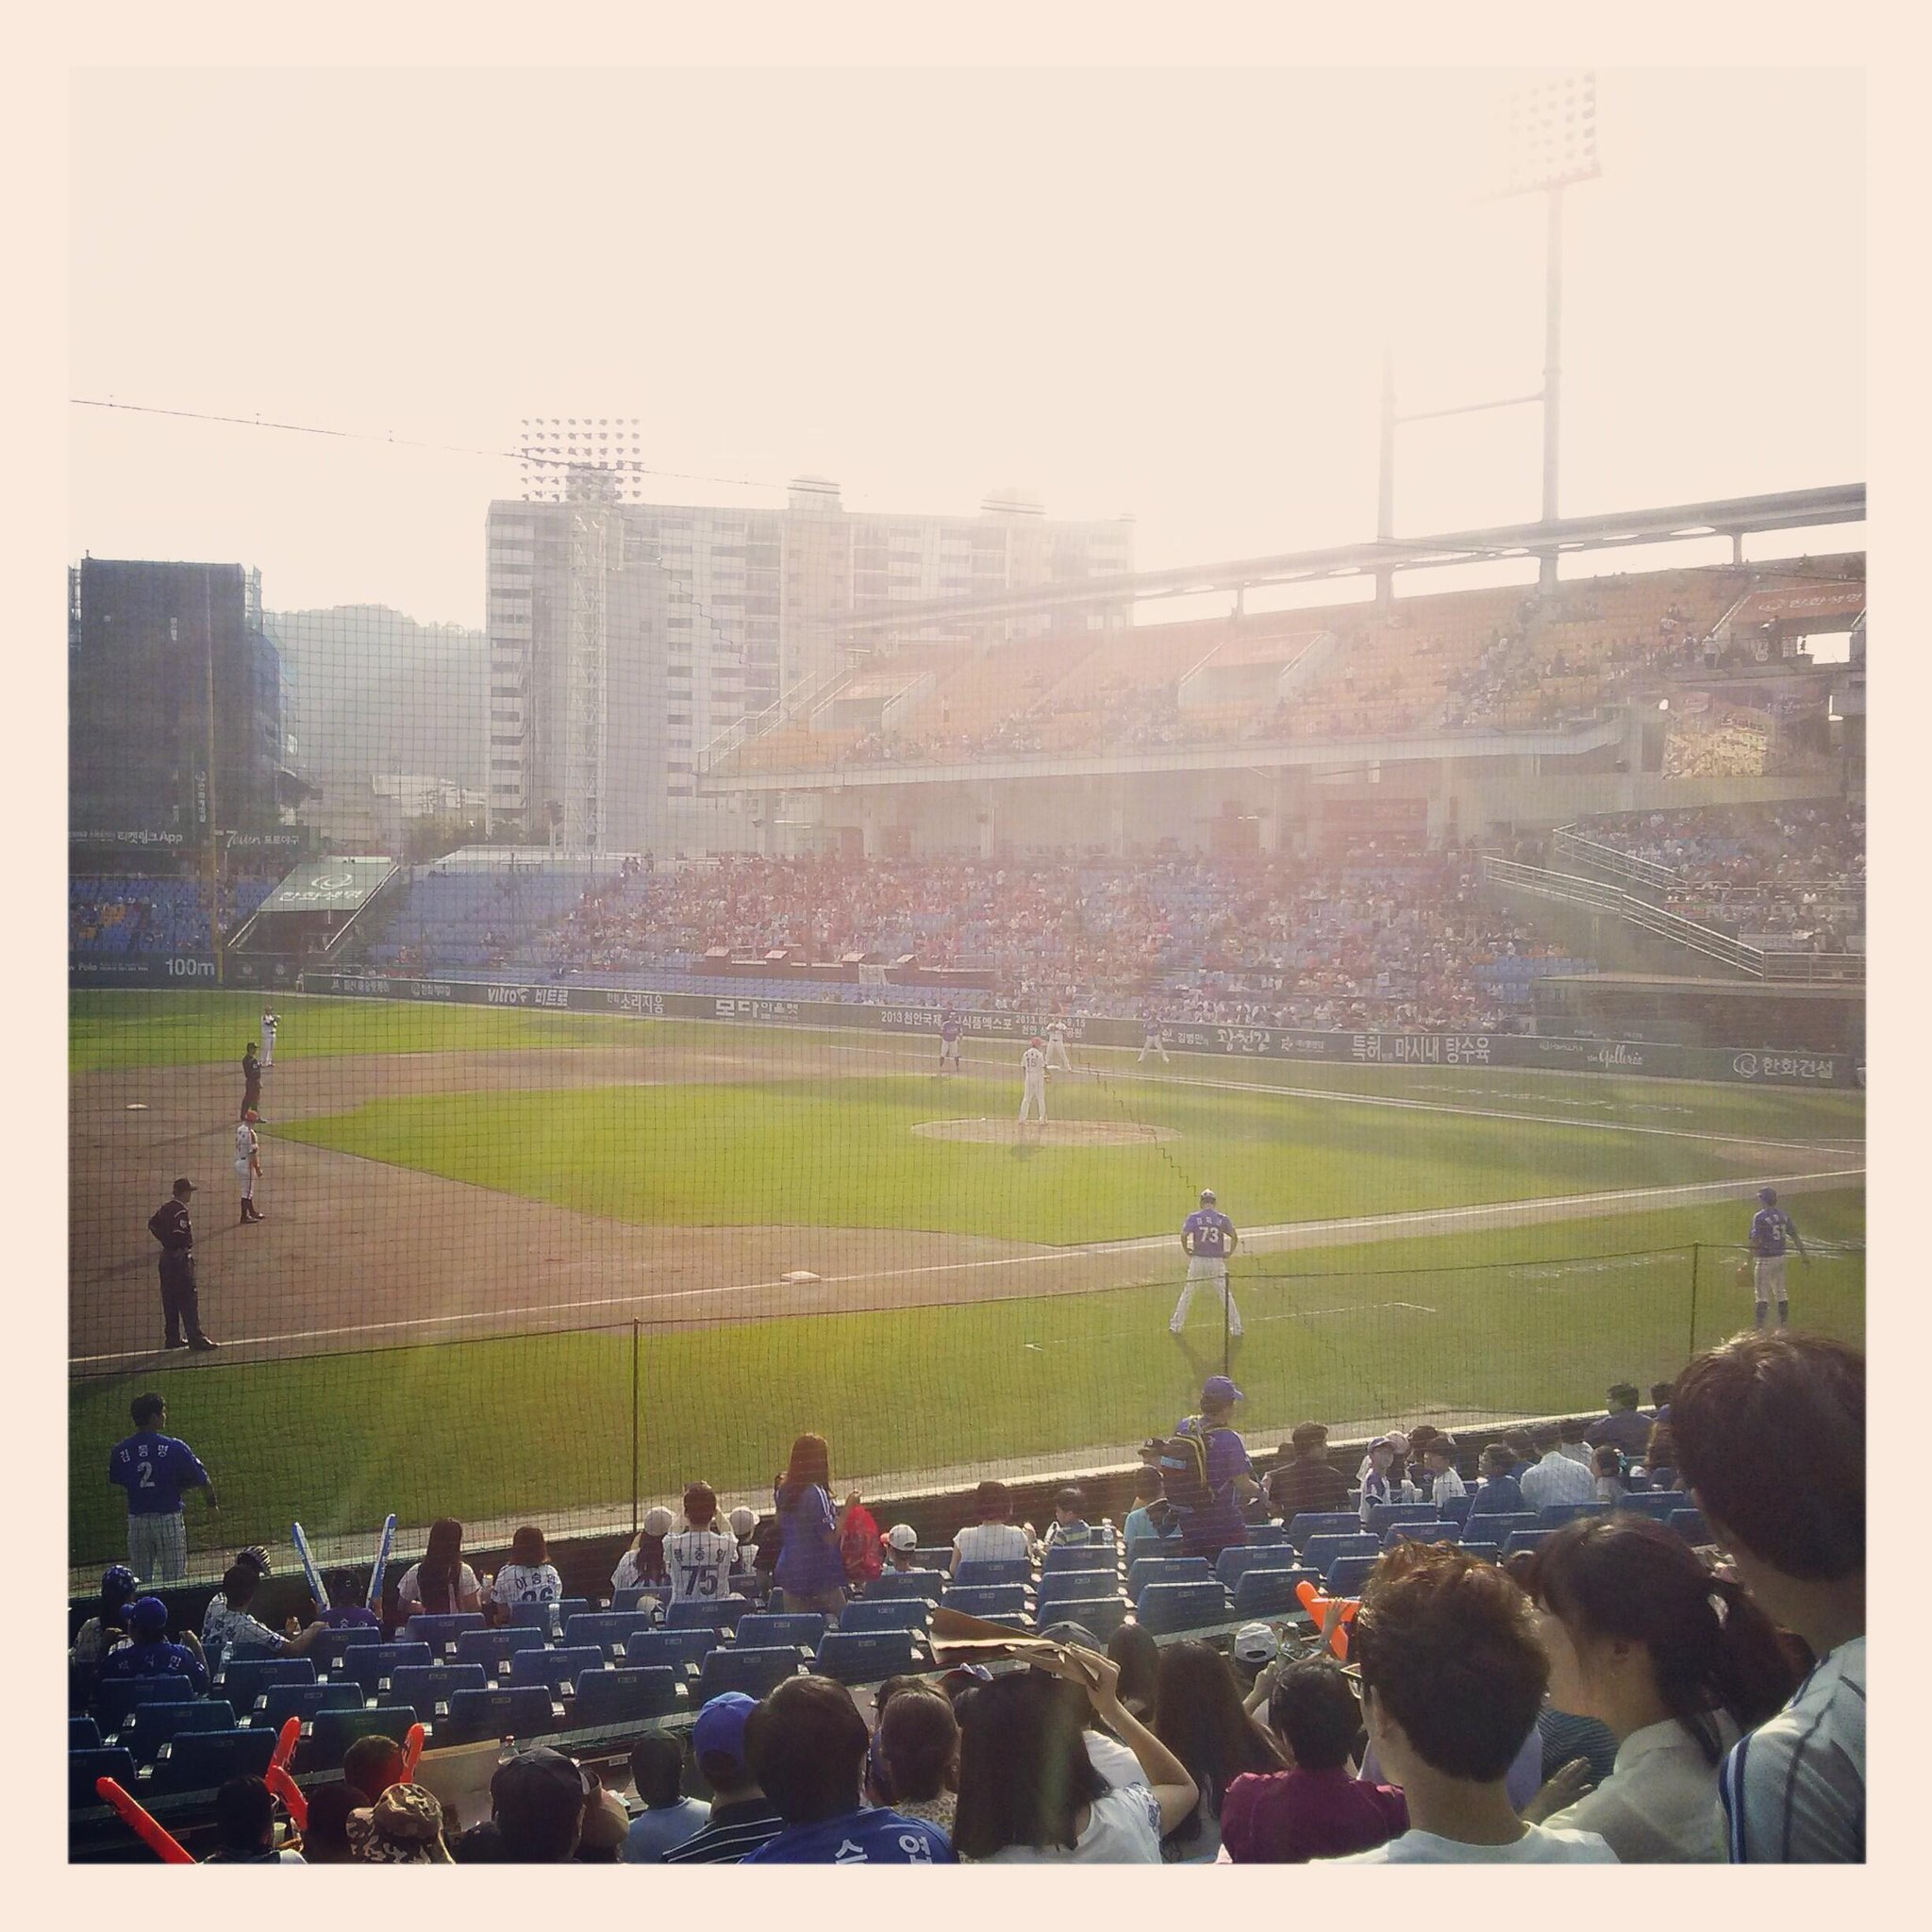 Taking in some Korean baseball. Hanwha Eagles vs Samsung Lions. http://t.co/pkebFRQFF6